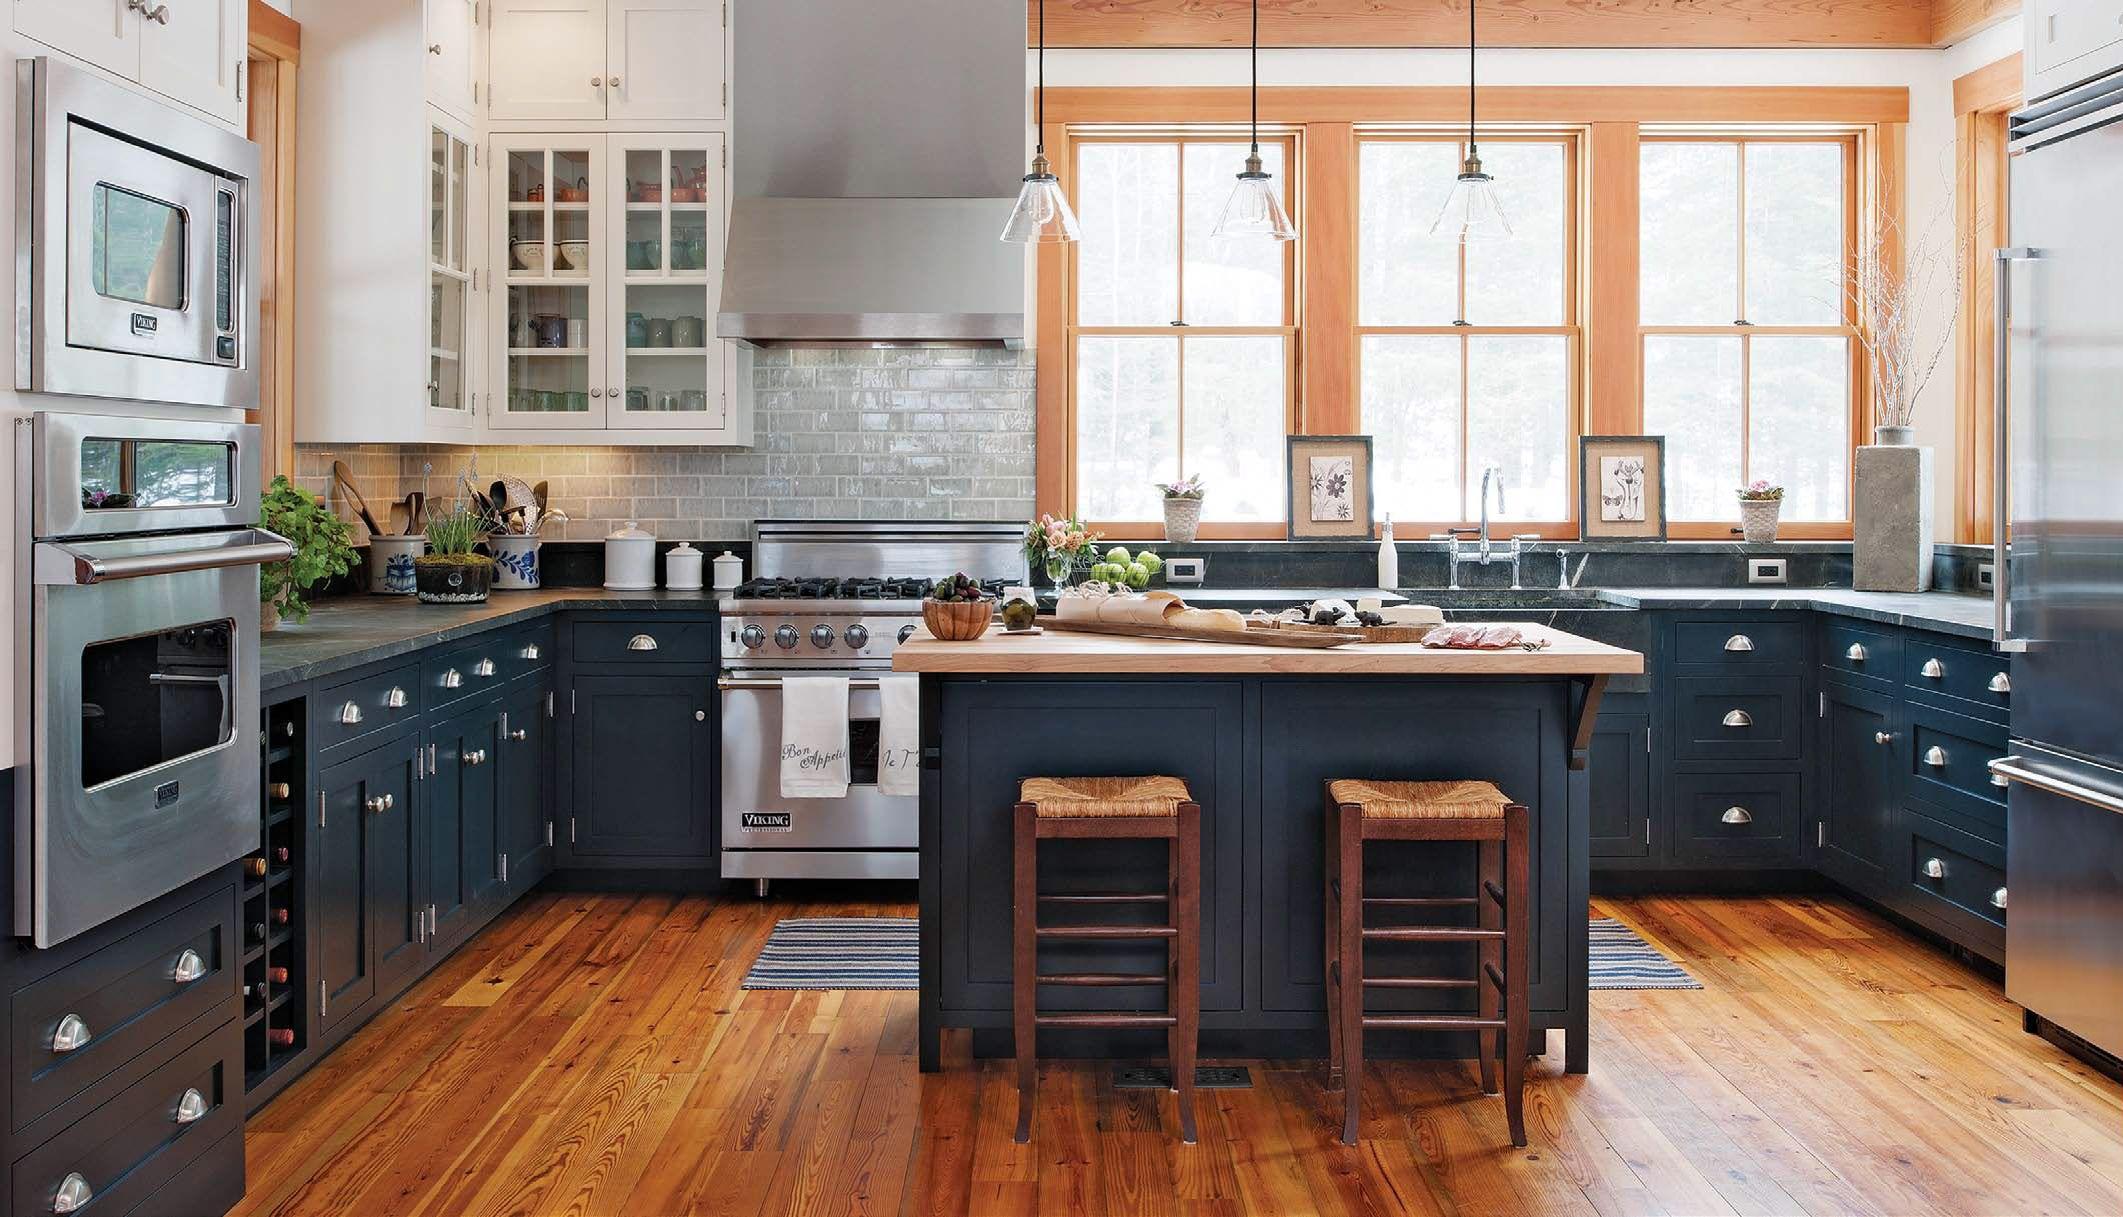 Look At Traffic Flow Storage Natural Colors And Daylight In This Slideshow Of Desig Modern Kitchen Design Kitchen Cabinet Design Transitional Kitchen Design